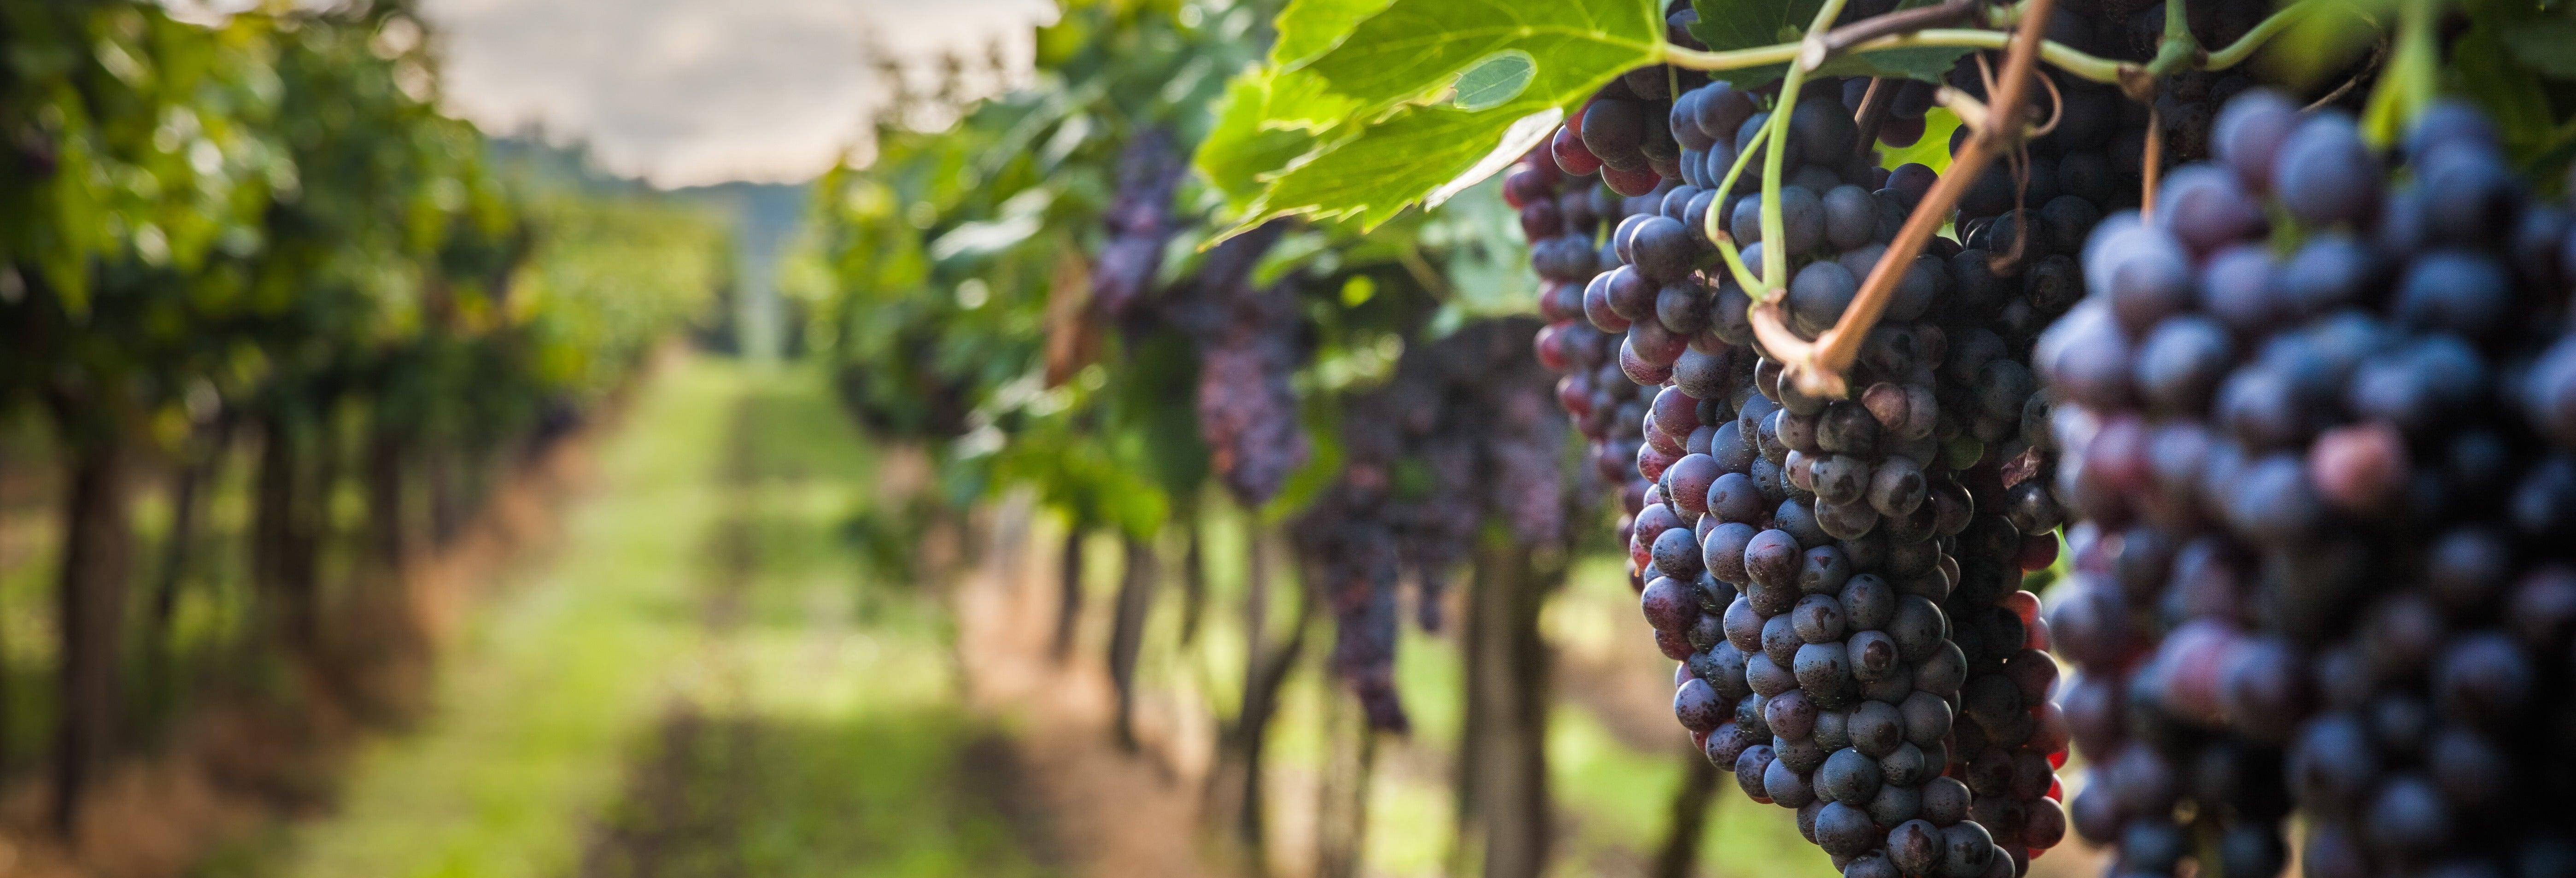 Visita à vinícola Cousiño Macul